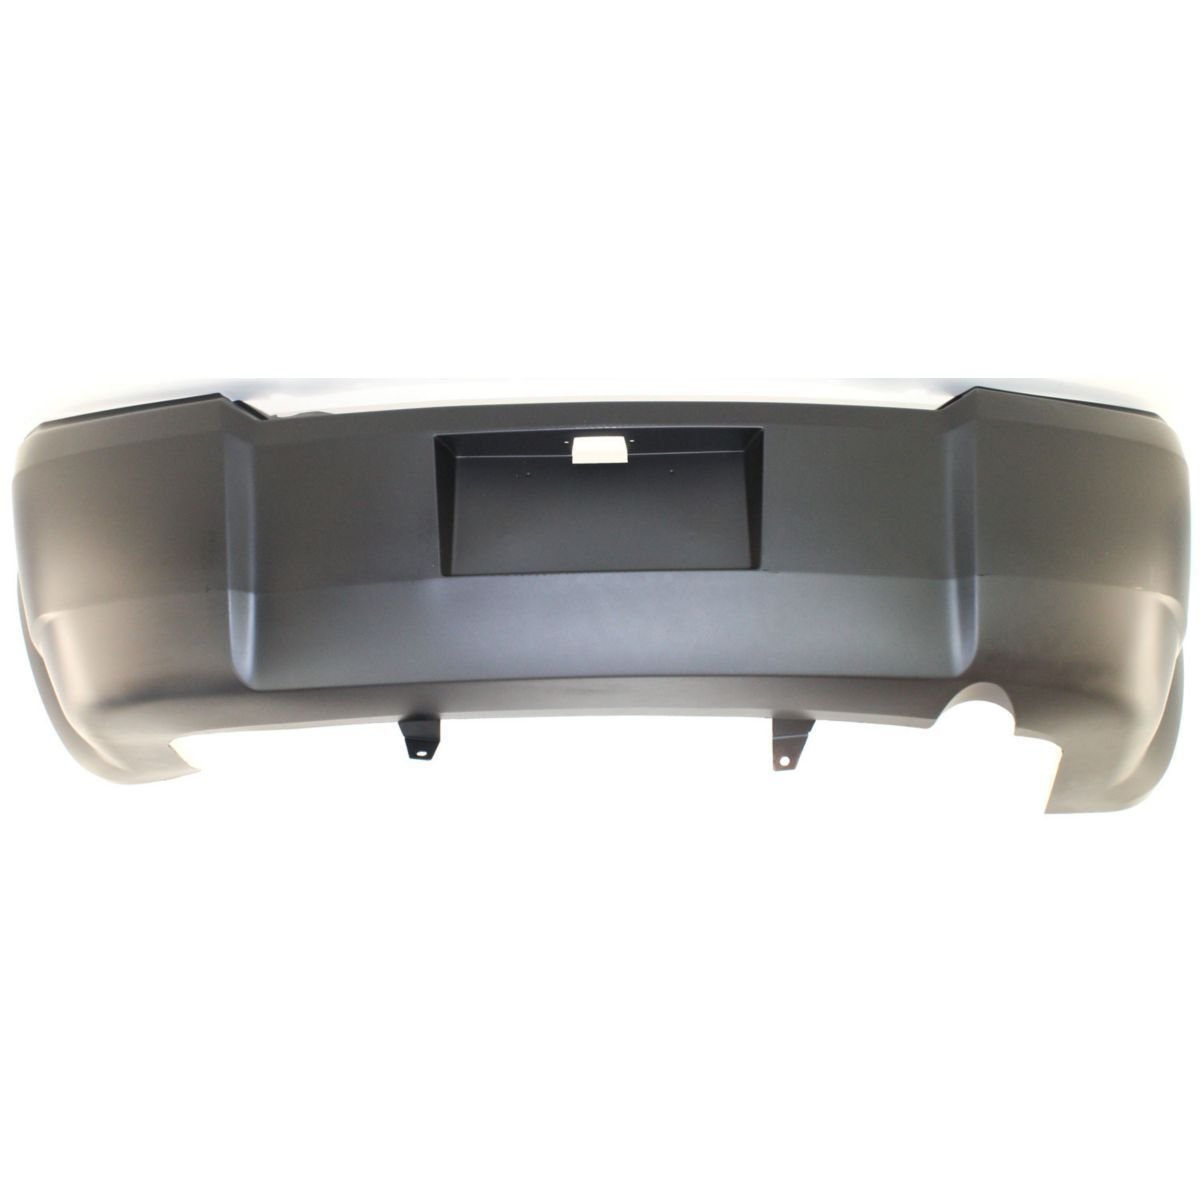 NorthAutoParts 68004683AB Fits Dodge Avenger Primered Rear Bumper ...